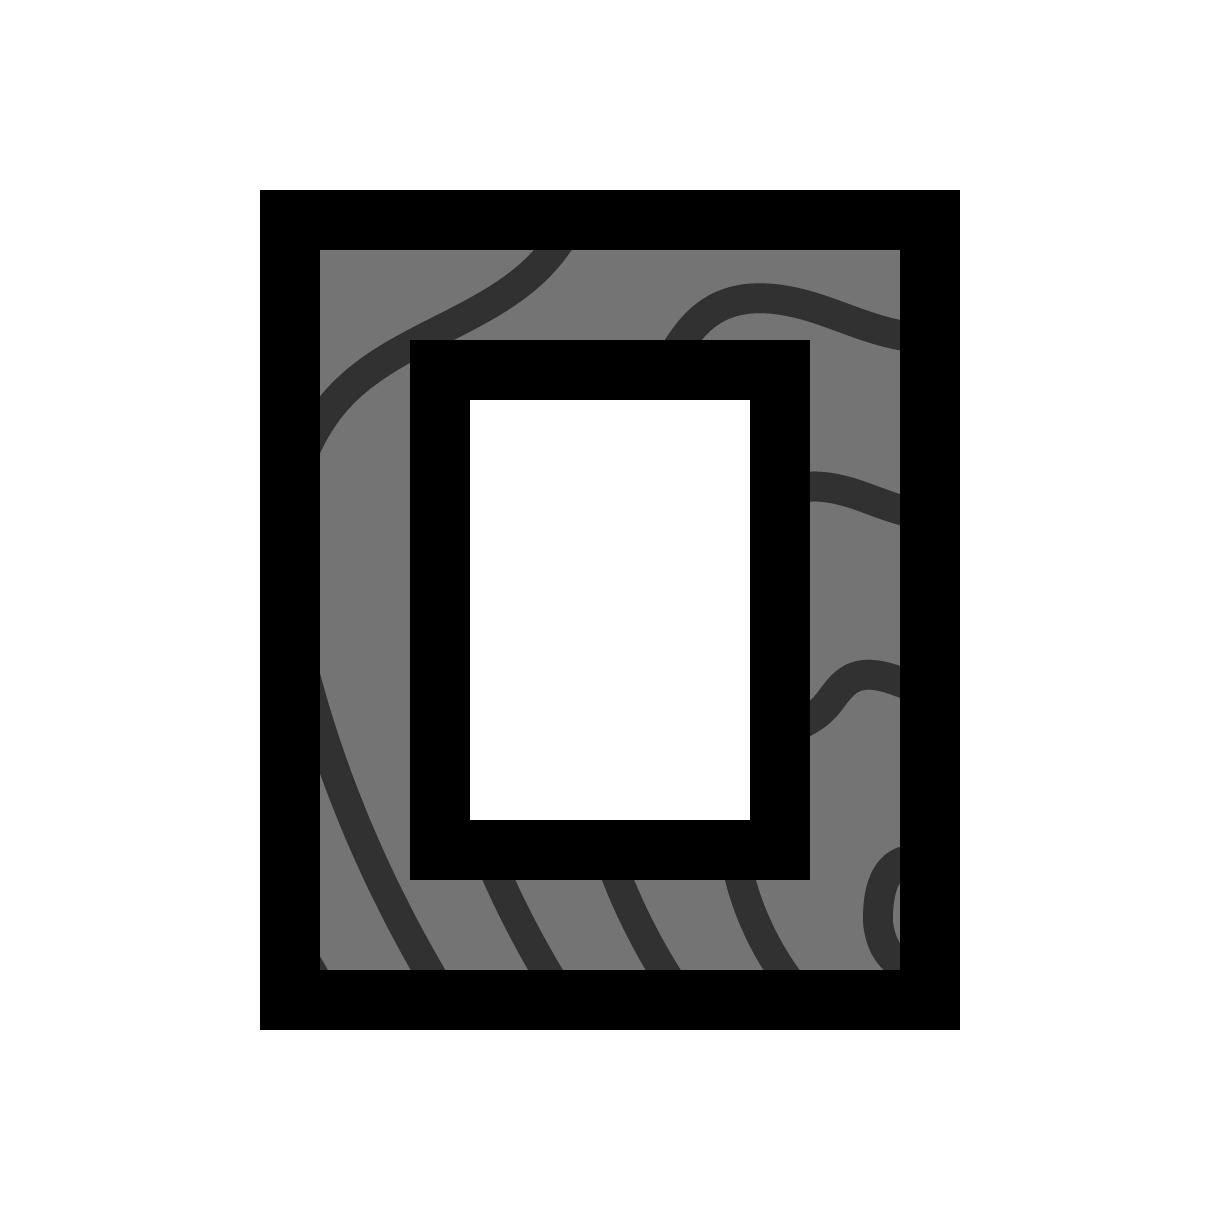 atlas_icon_display-01